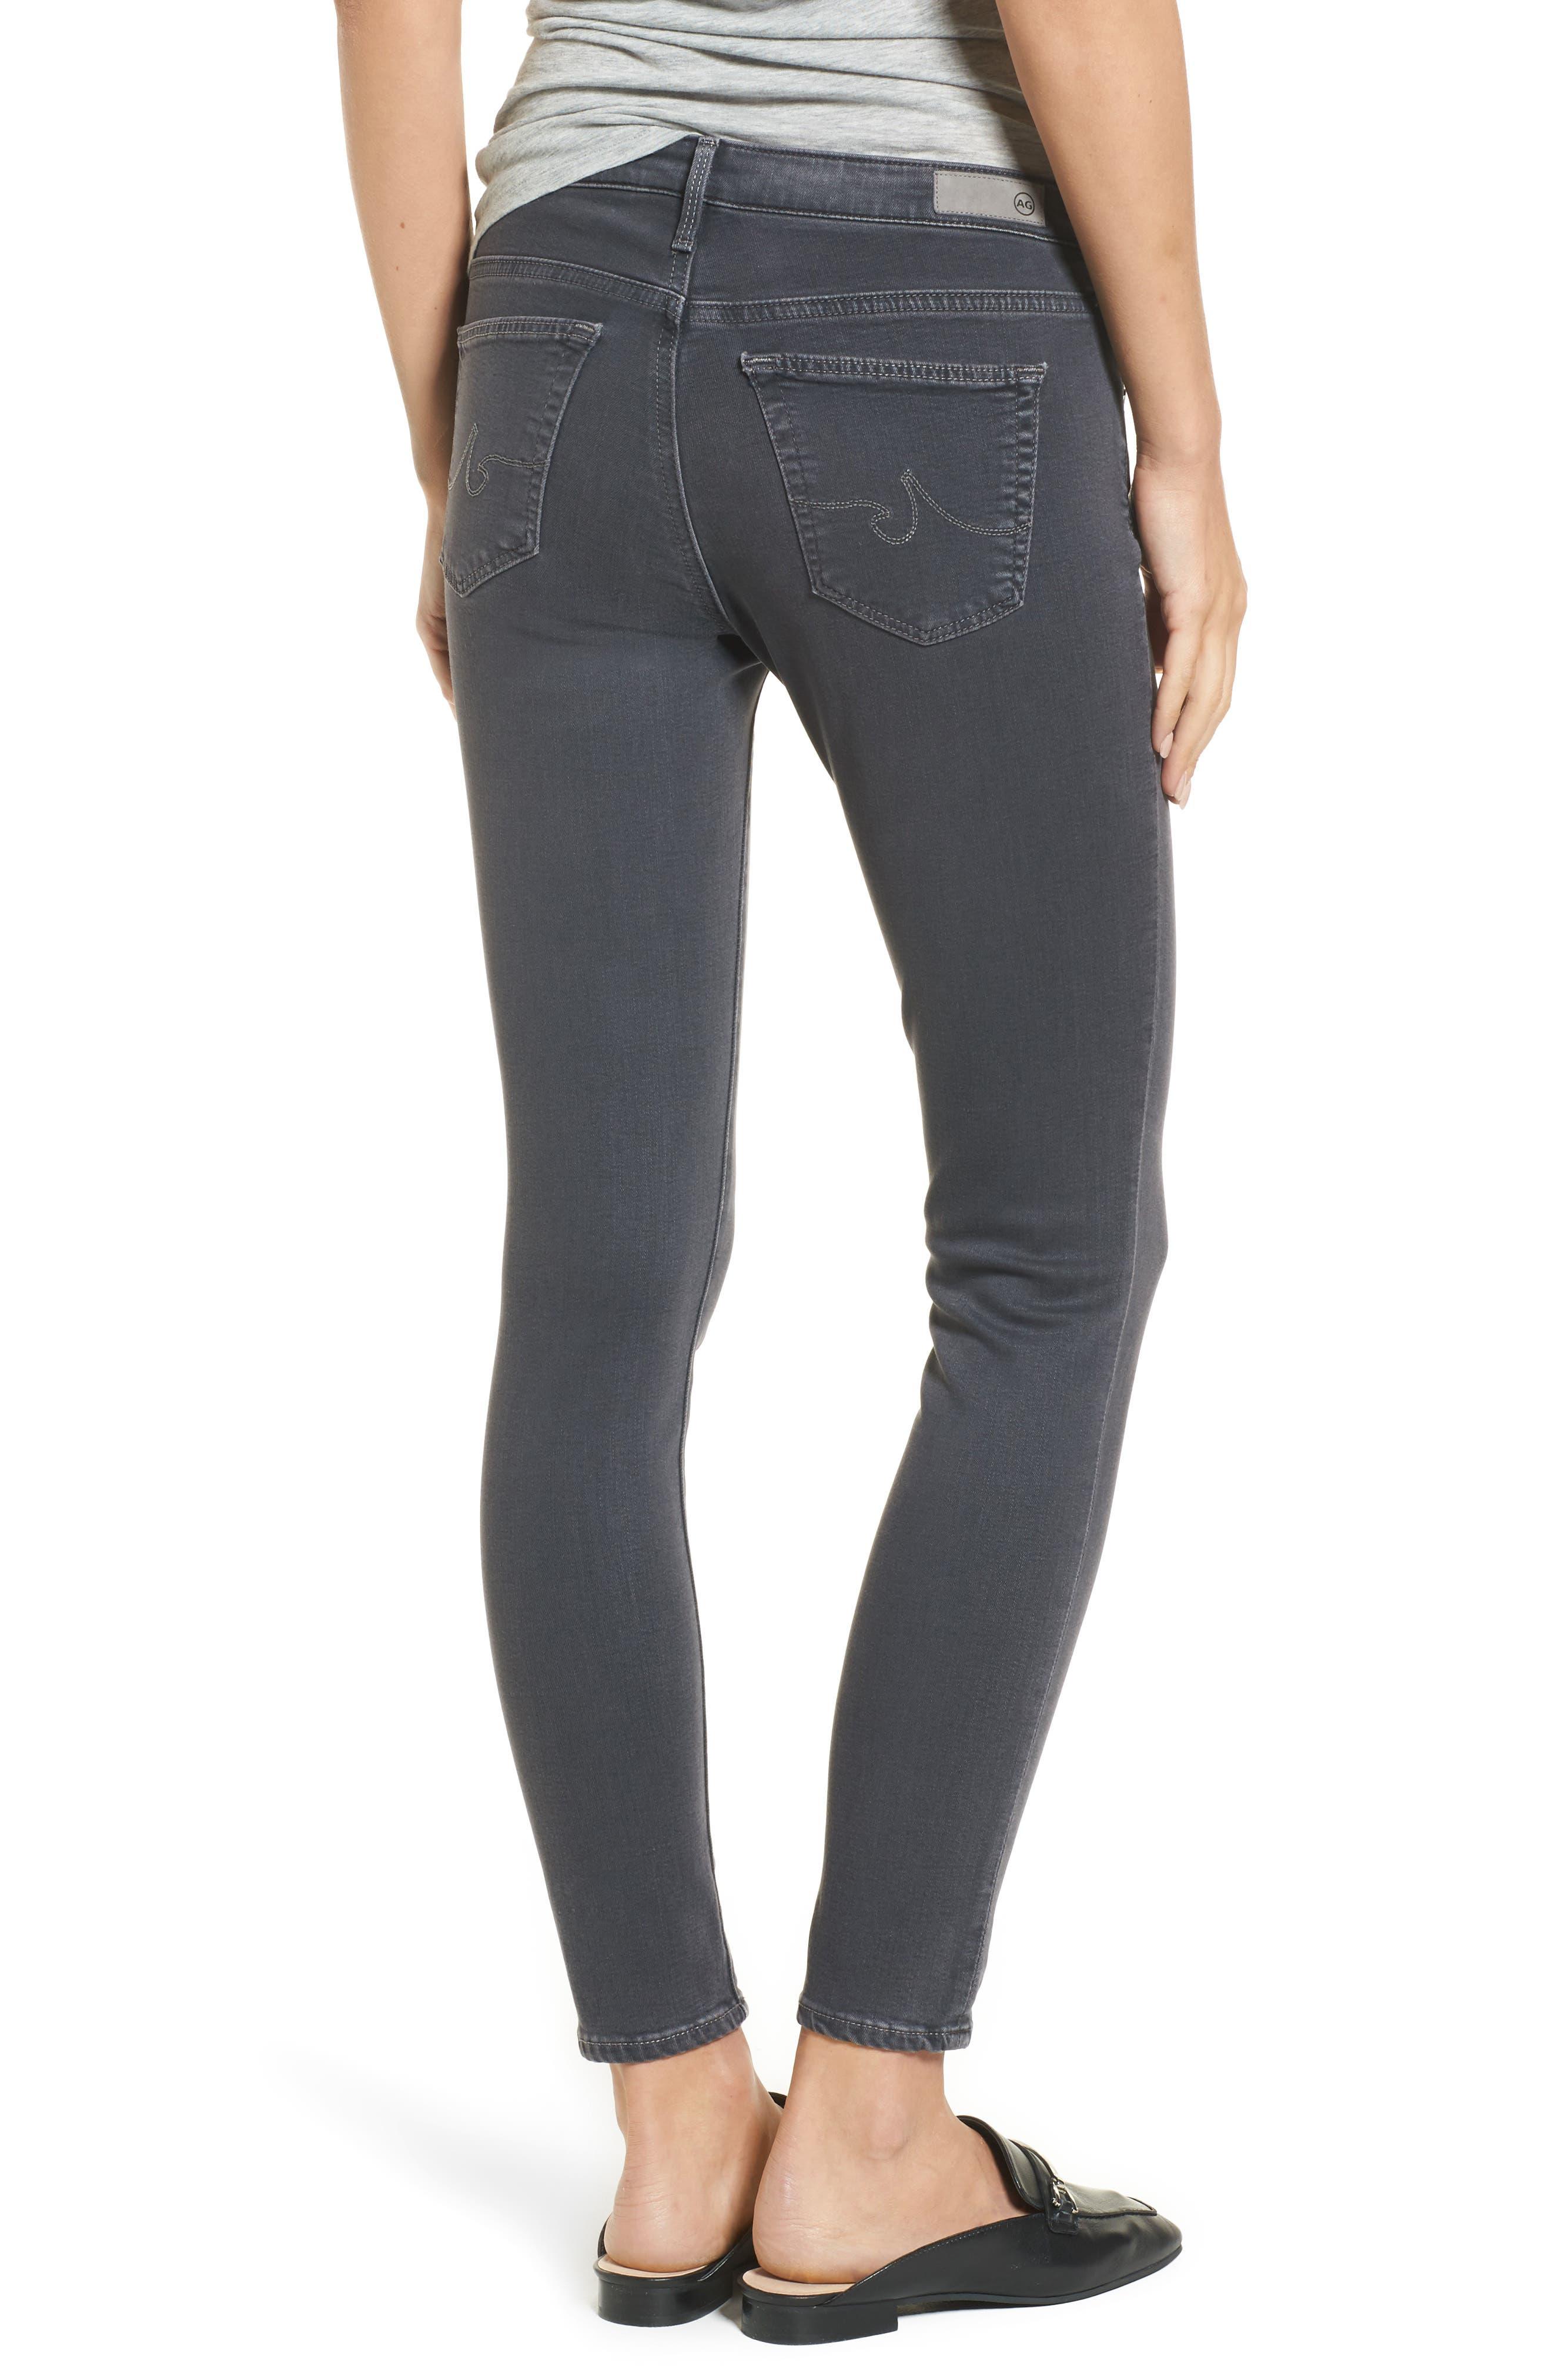 Ankle 'The Legging' Super Skinny Jeans,                             Alternate thumbnail 2, color,                             Raven Plume